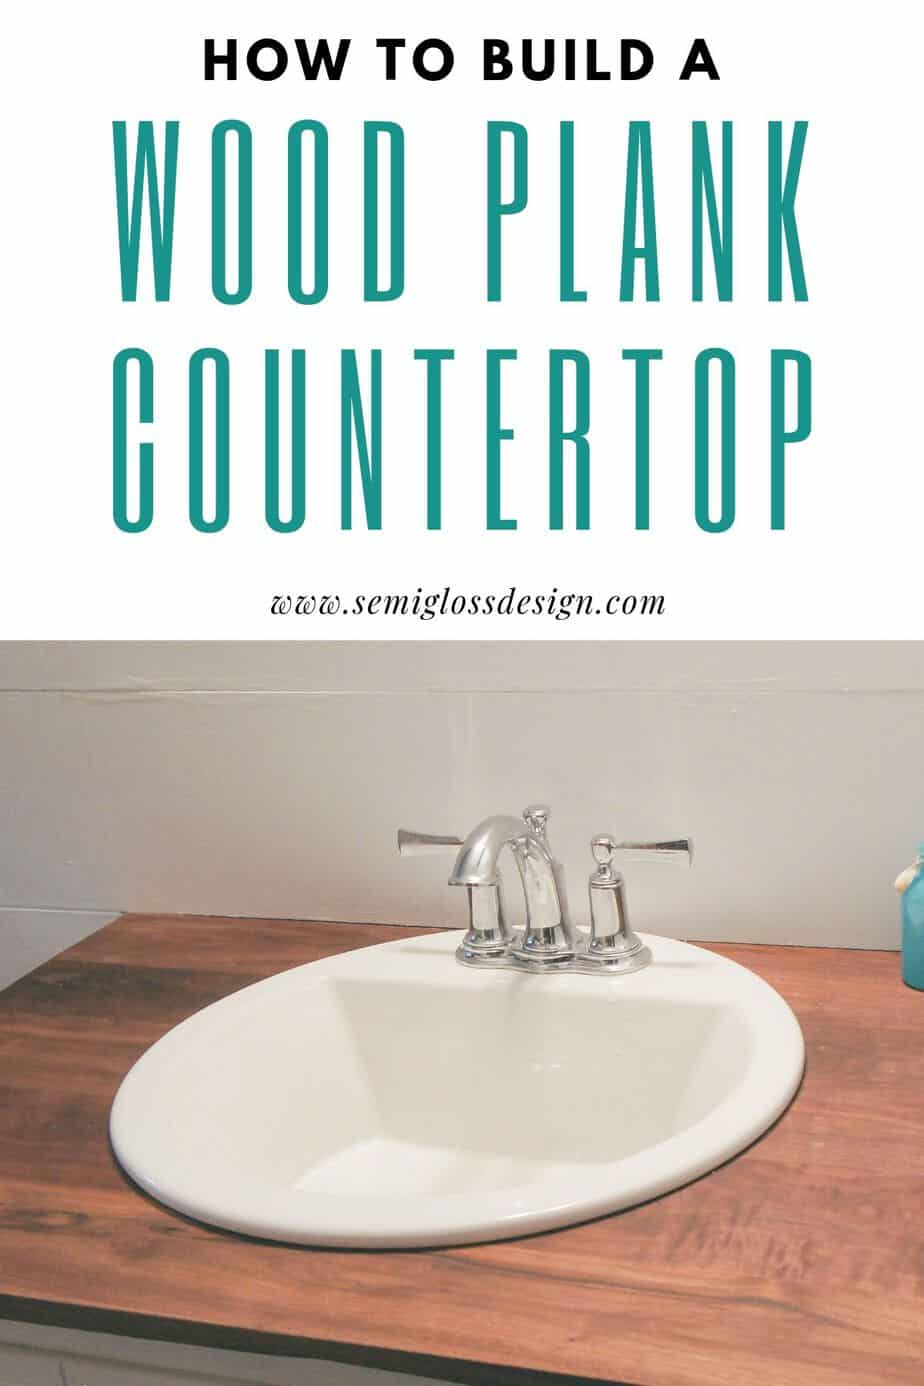 DIY wood plank countertop